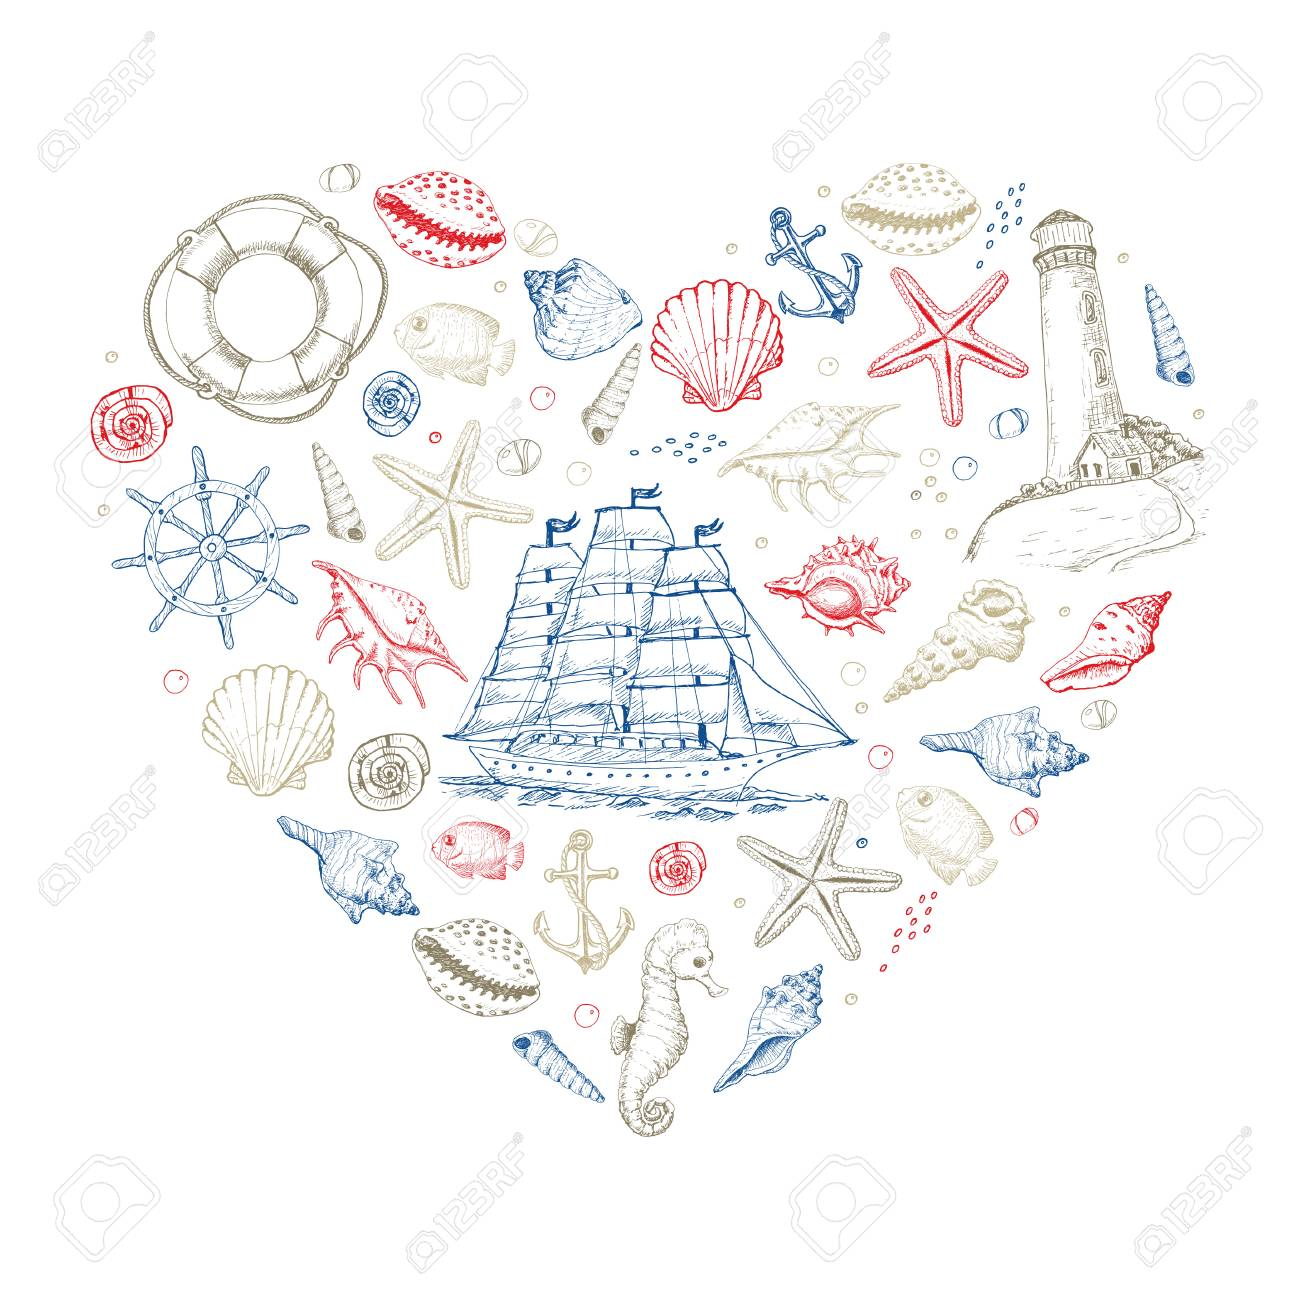 Vector heart from summer marine elements - 122749111